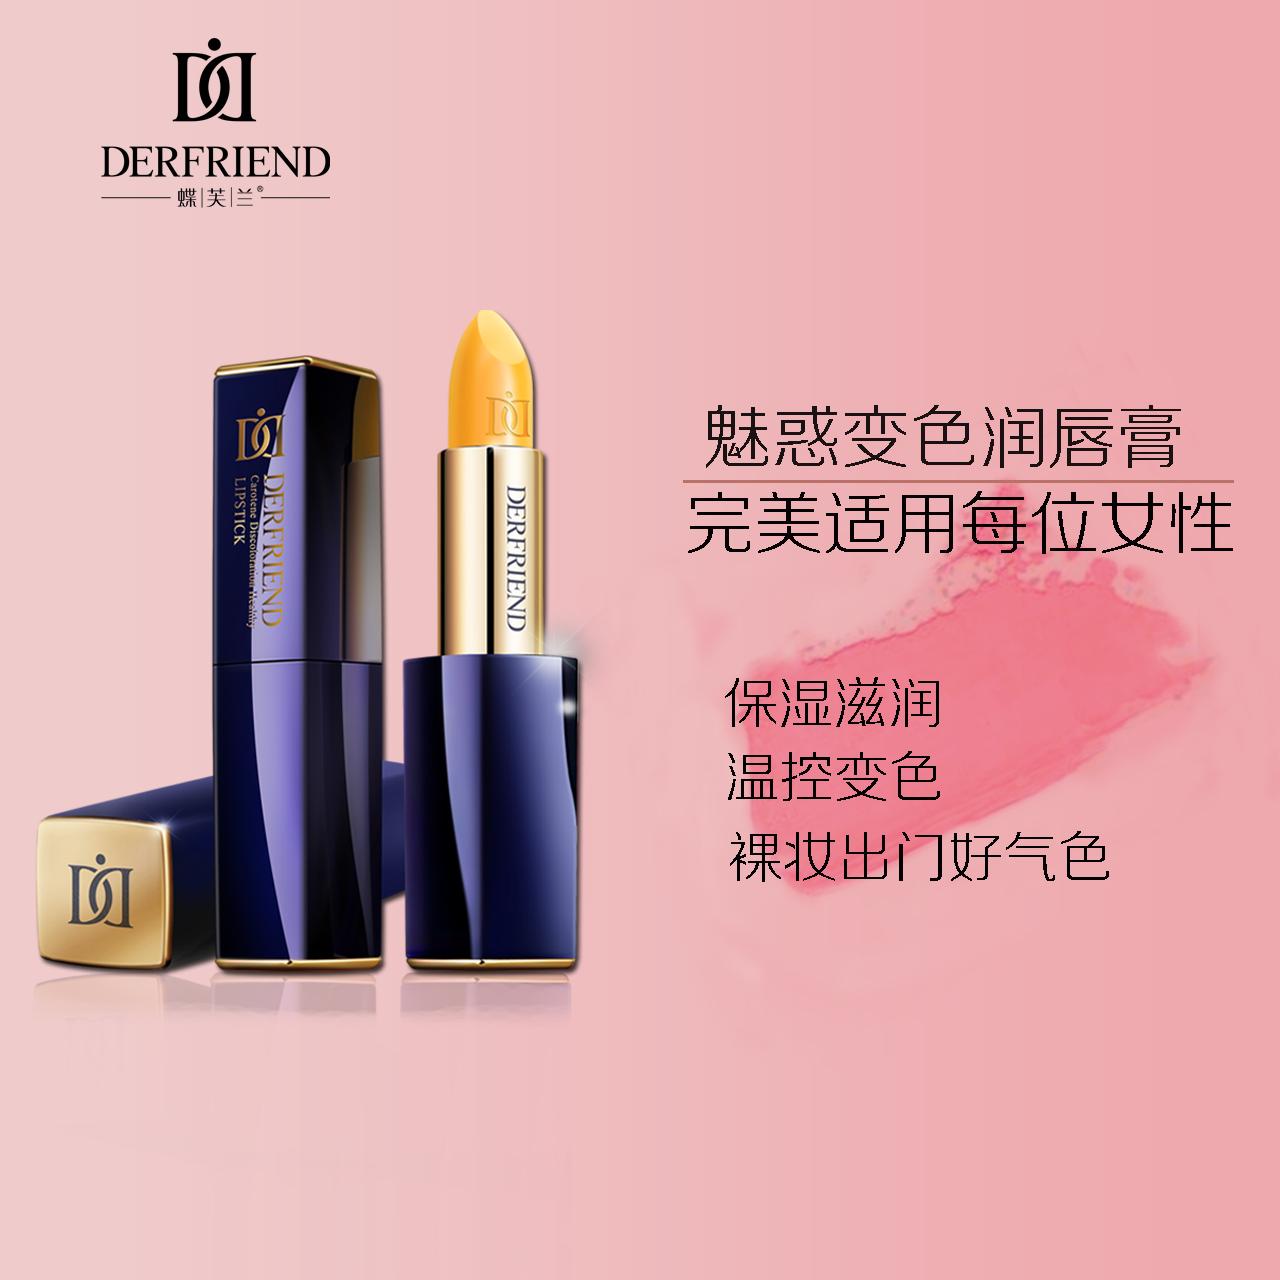 Butterflies, carotene, lipstick, lipstick, lipstick, pregnancy, moisturizing lipstick.